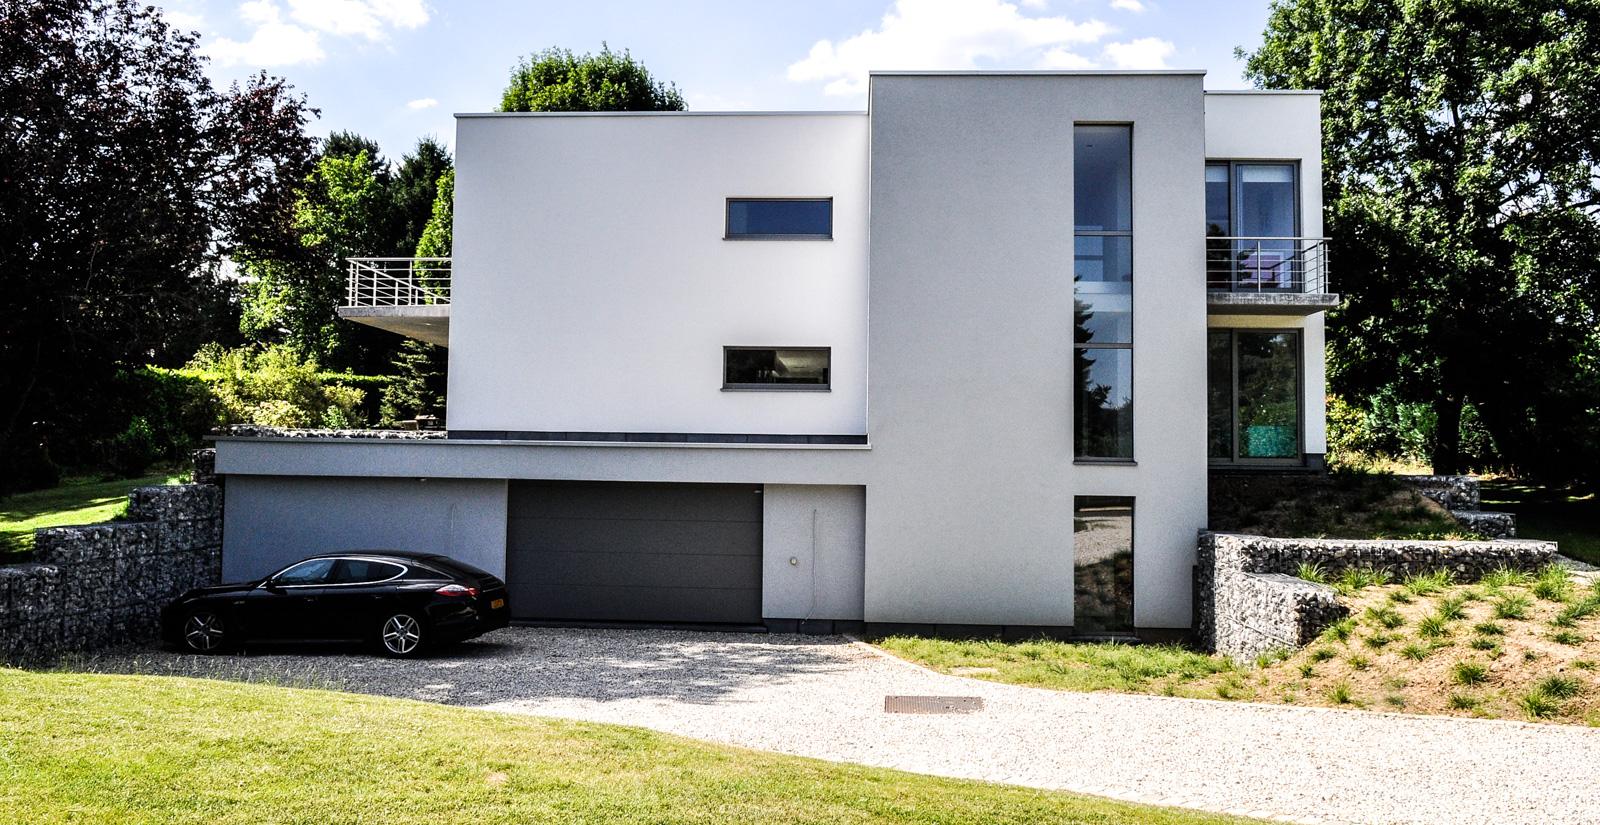 16_house_villa_location_shooting_film_photo_belgique_belgium-1